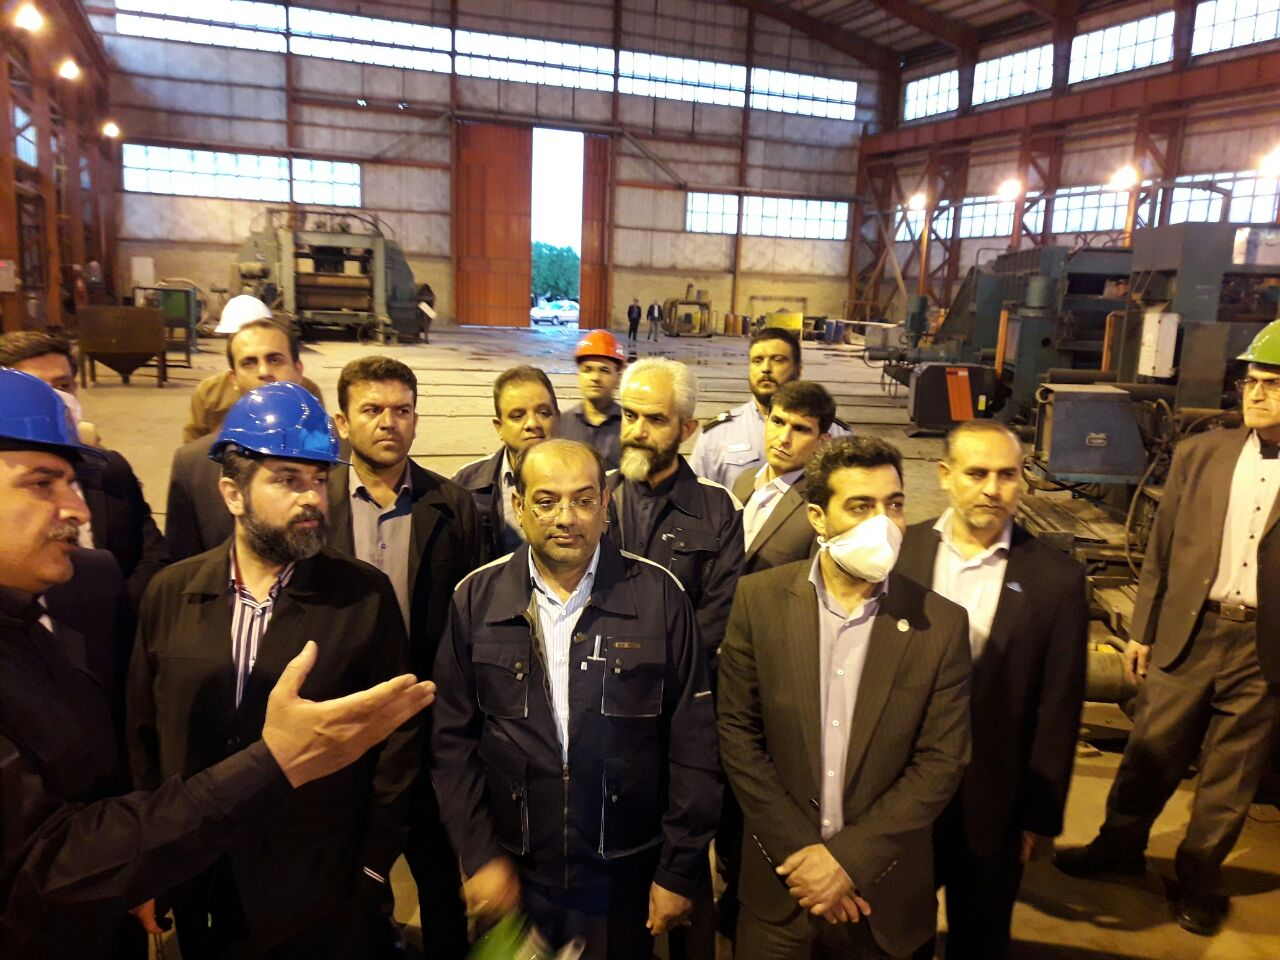 IMG 20200502 063817 395 شرکت لولهسازی اهواز در سال جهش تولید ظرفیت همکاری با صنایع را افزایش داد